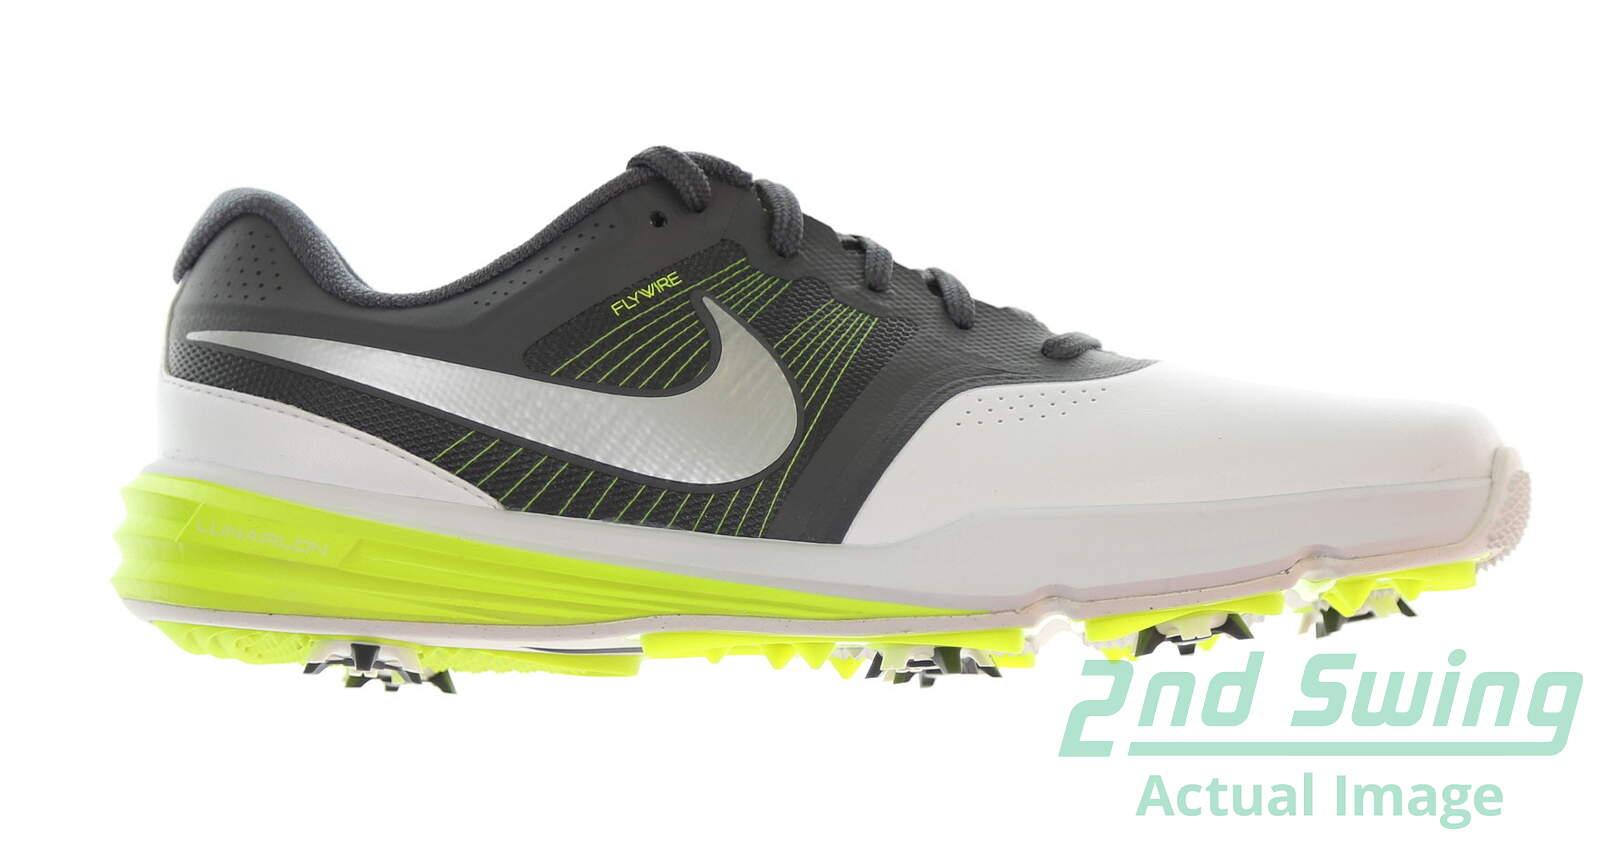 34a75e48bdcfe New Mens Golf Shoe Nike Lunar Command 9.5 White/Grey MSRP $150 - Golf  Footwear